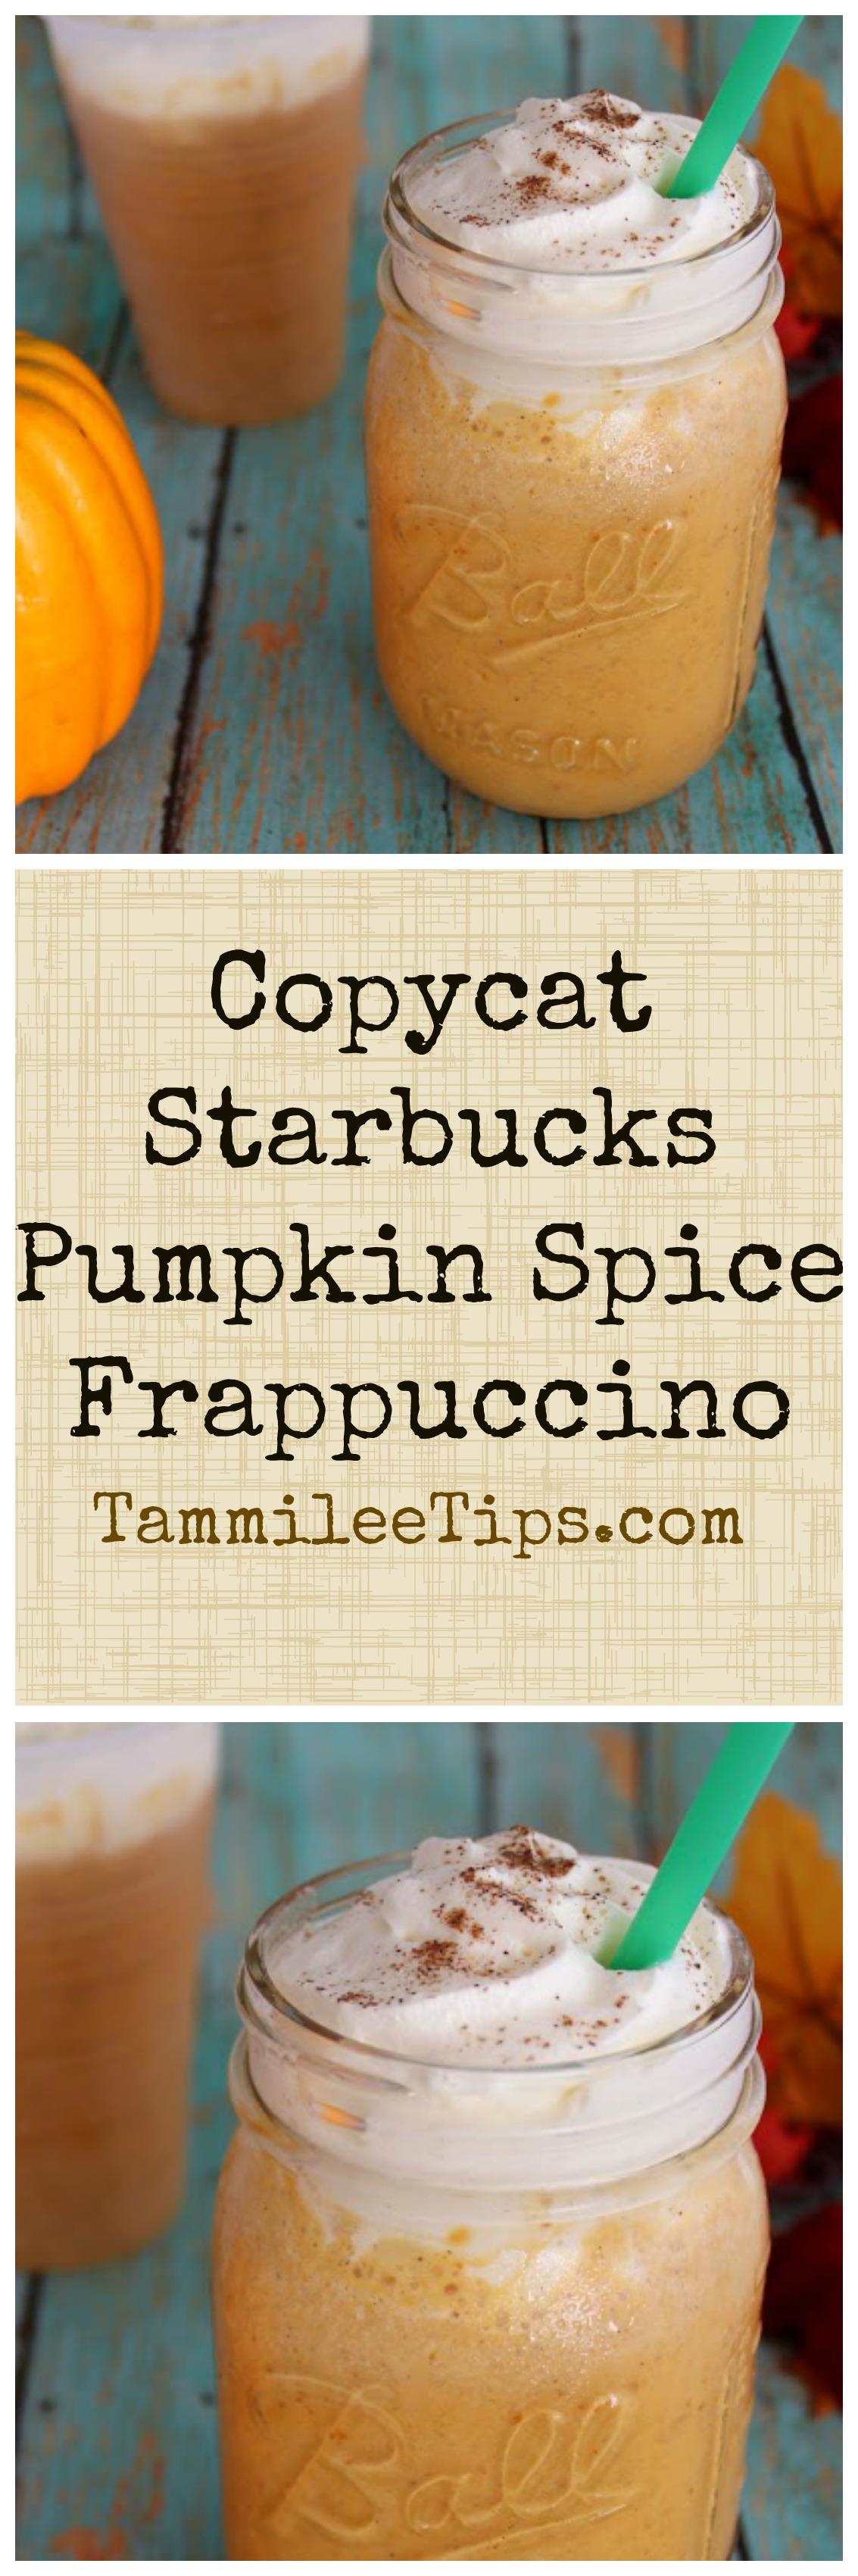 How to make a Copy Cat Starbucks Pumpkin Pie Frappuccino